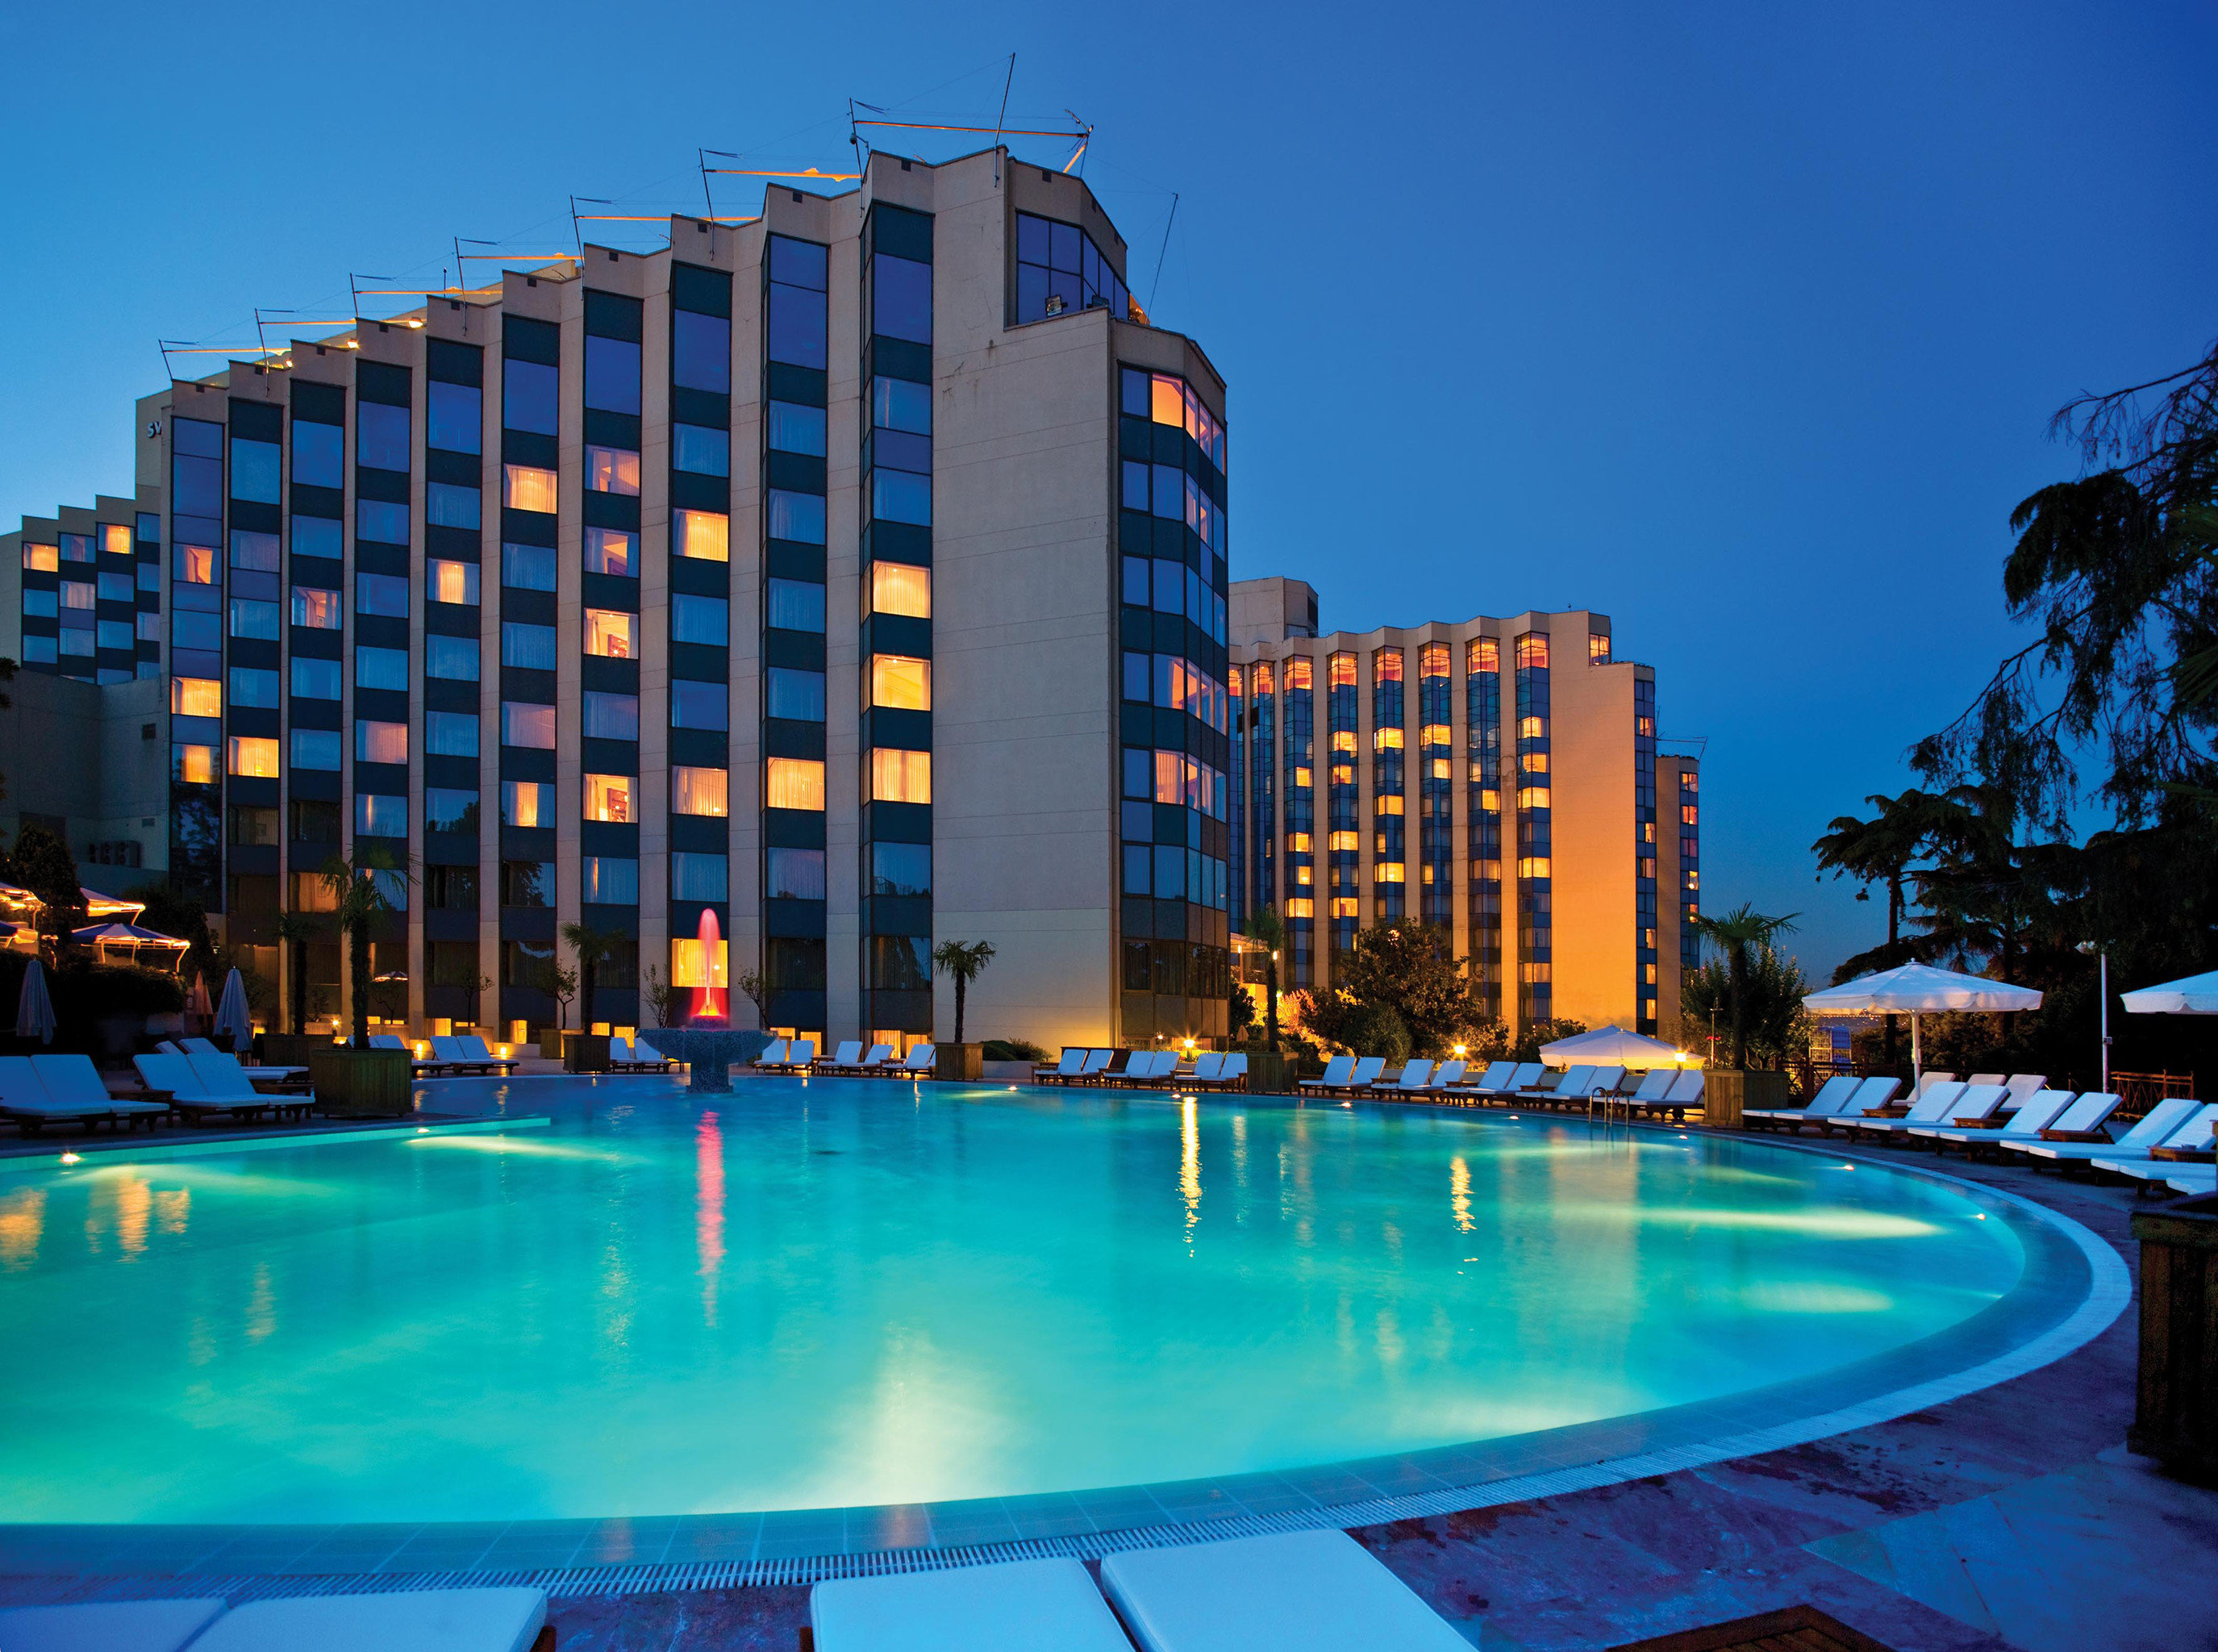 Beachfront Hip Lounge Luxury Modern Pool sky swimming pool condominium Harbor Resort blue marina